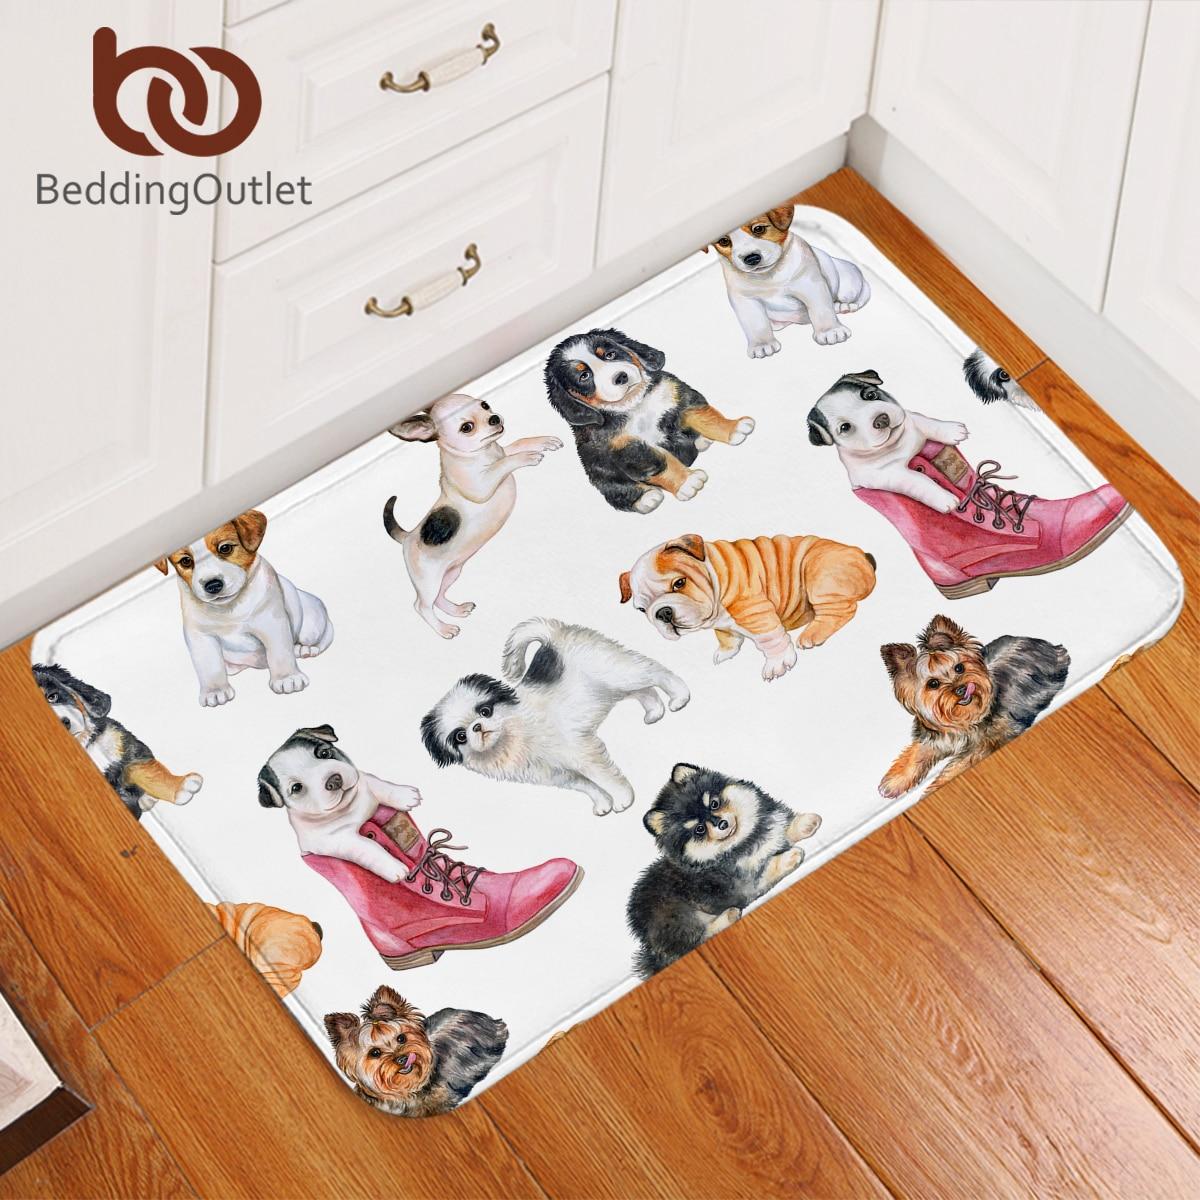 BeddingOutlet Shoes Puppy Carpet Bulldog Floor Mat for Kids Room Non slip Pink Cartoon Rug Animal Colorful Doormat alfombra|Rug| |  - title=